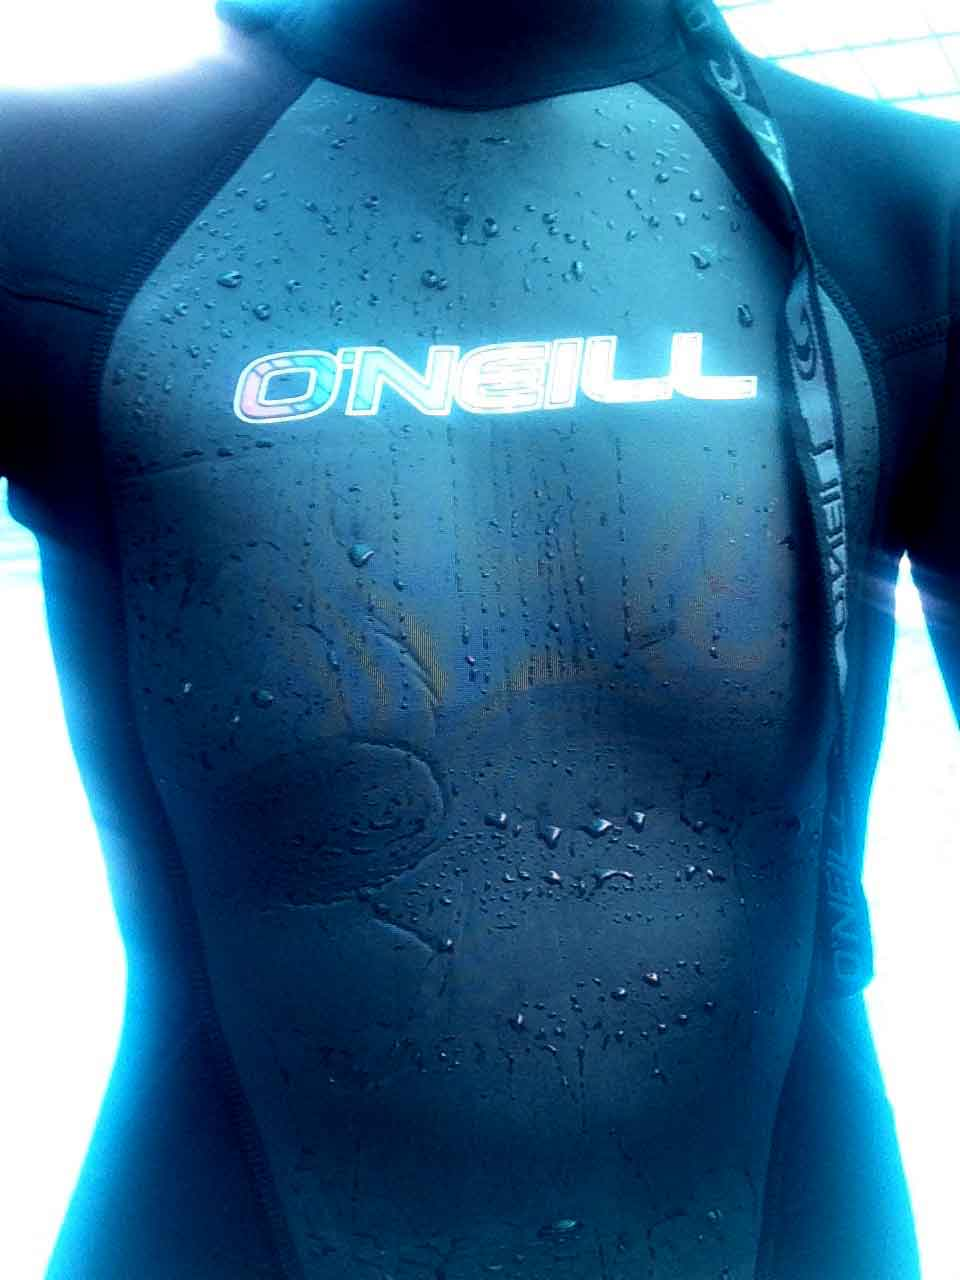 My O'Neill wetsuit. Image©gunjanvirk